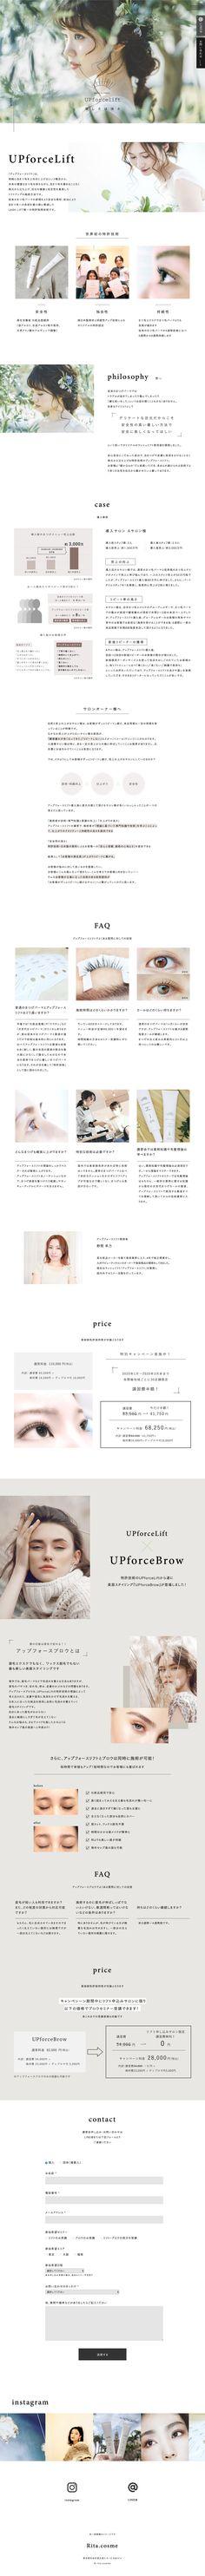 Web Design,Webデザイン,ウェブデザイン,美容,まつげ,眉毛,アップフォースリフト,白,シンプル,女性,